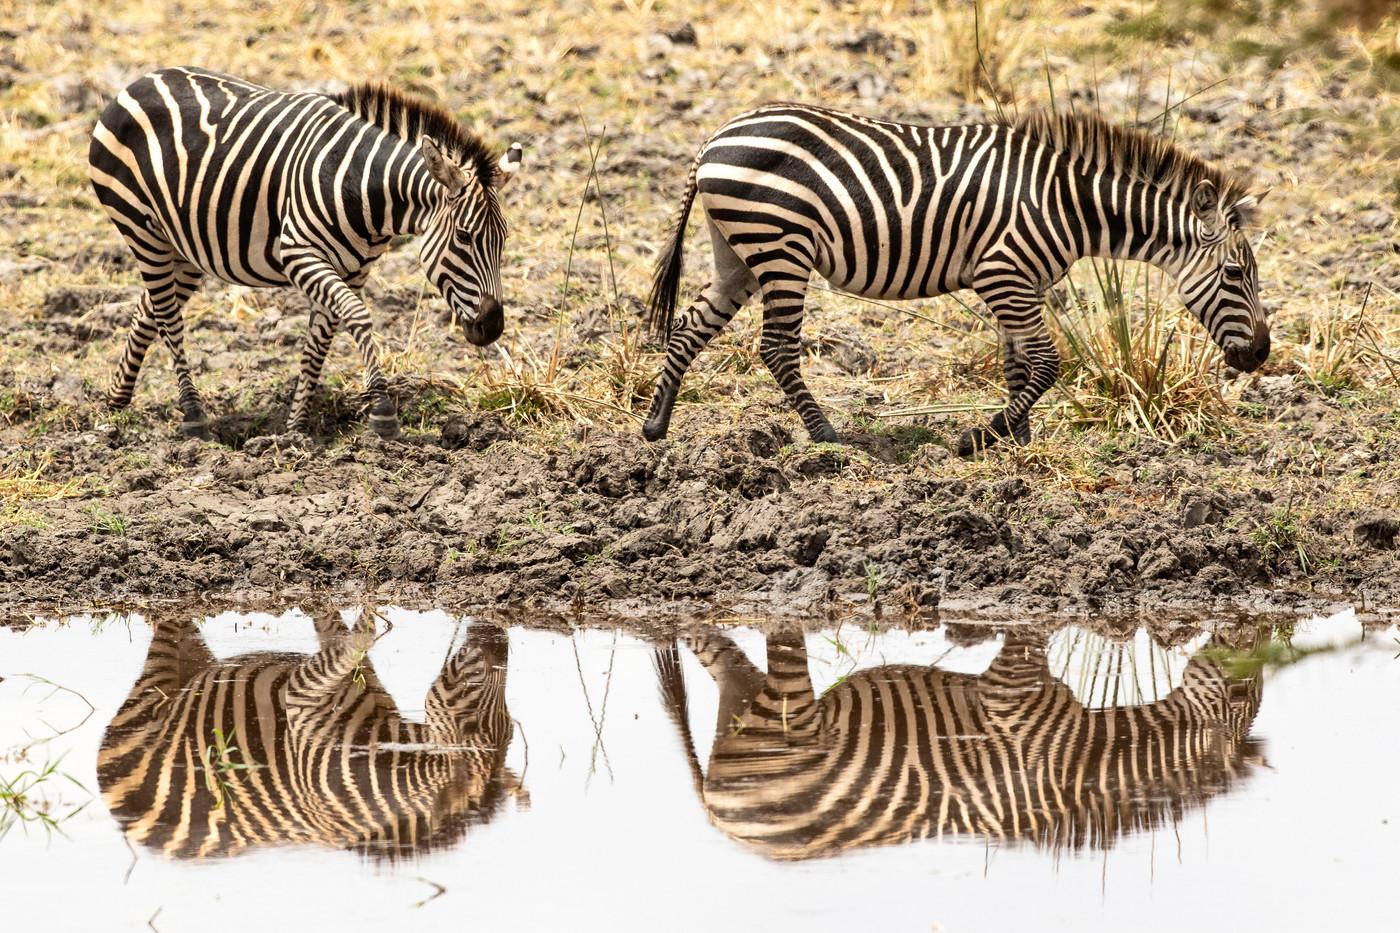 Plains Zebras in Tarangire NP, Tanzania